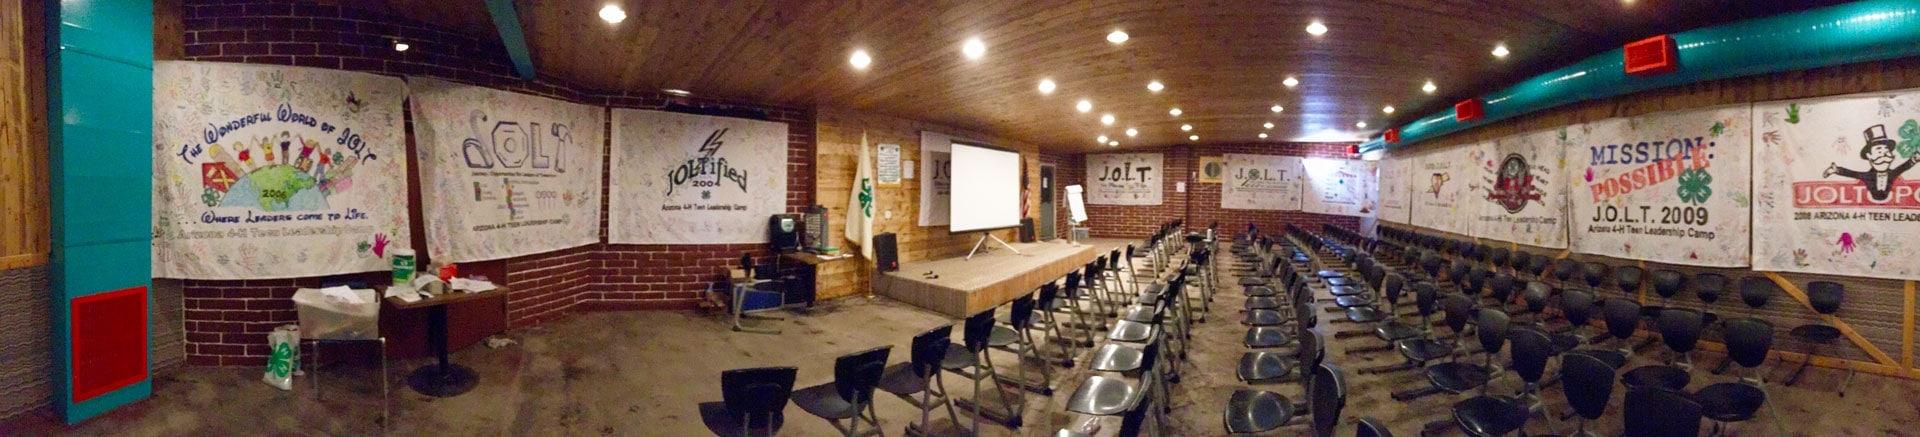 chiefs-room